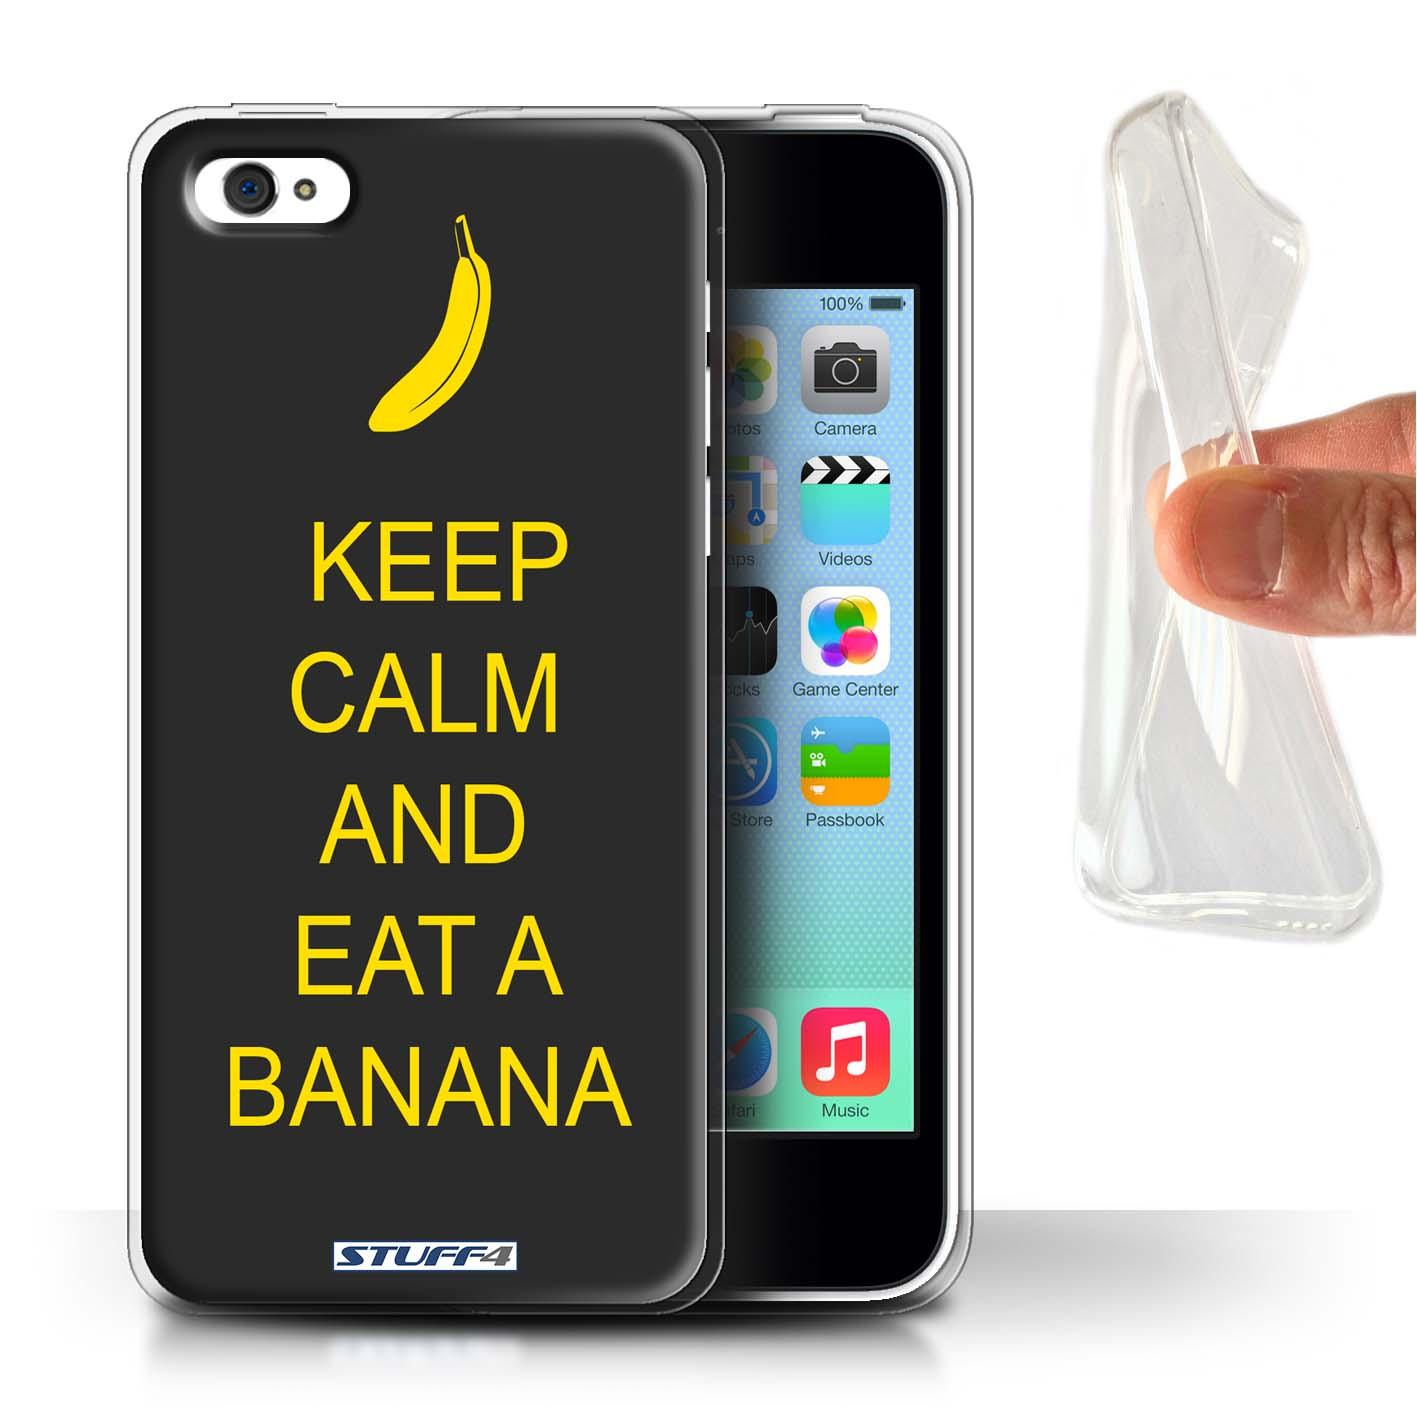 STUFF4-Gel-TPU-Case-Cover-for-Apple-iPhone-5C-Keep-Calm